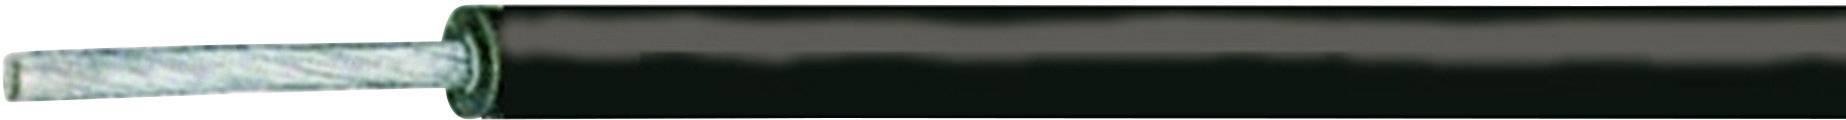 Stikalna žica SiL-SiAF 1 x 2.50 mm, modra XBK Kabel cena za meter